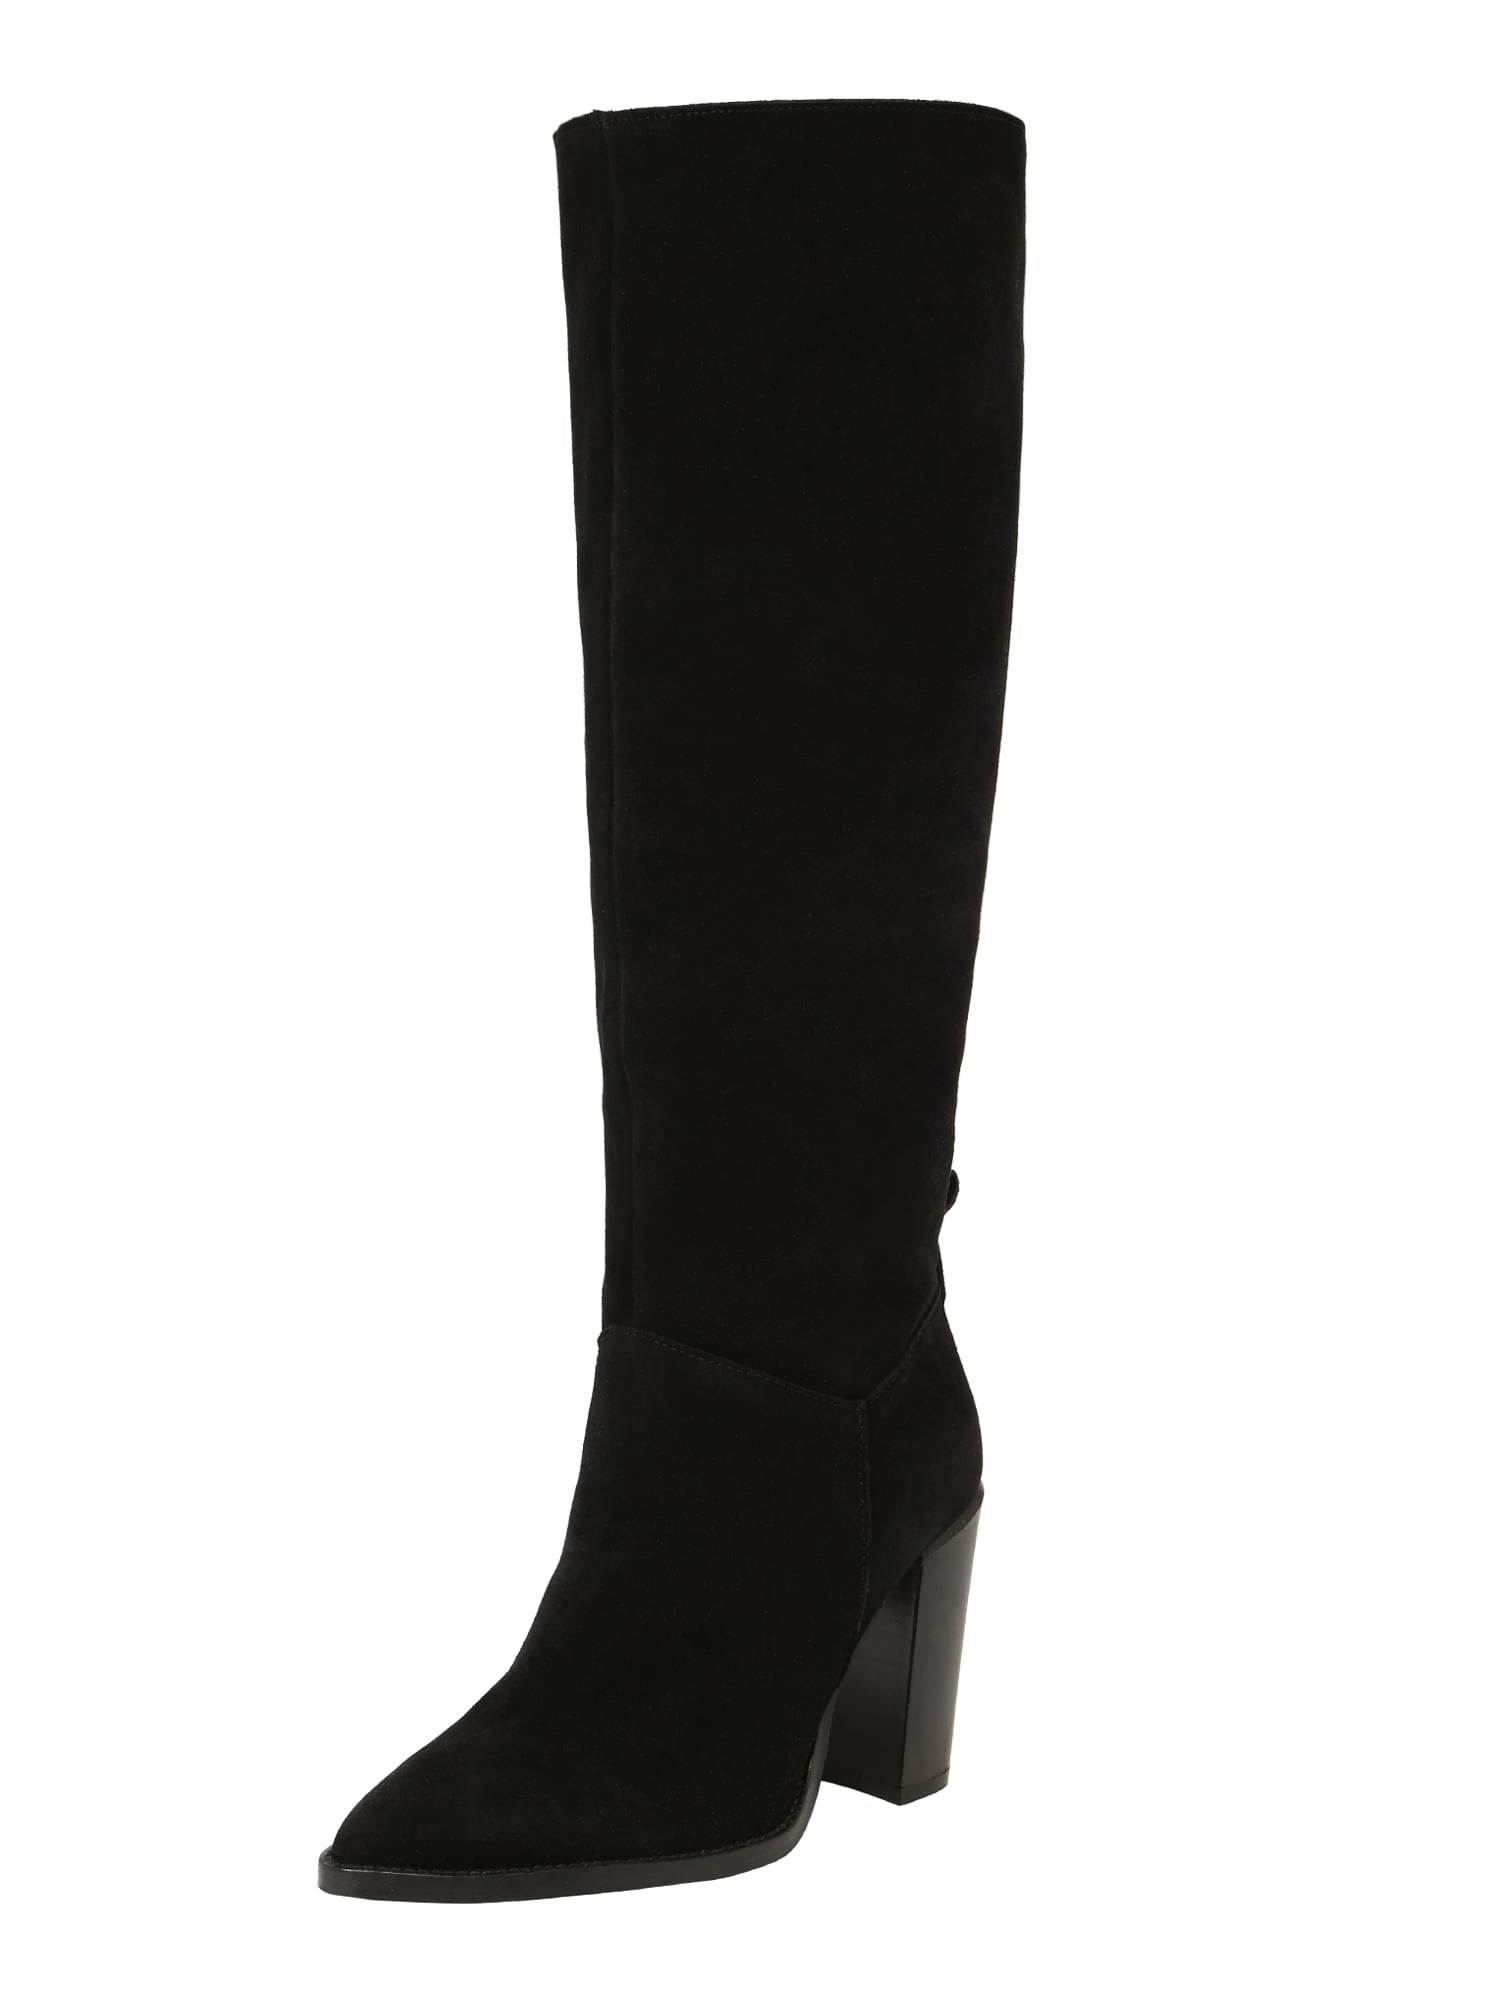 ABOUT YOU Auliniai batai su kulniuku 'Soraya' juoda